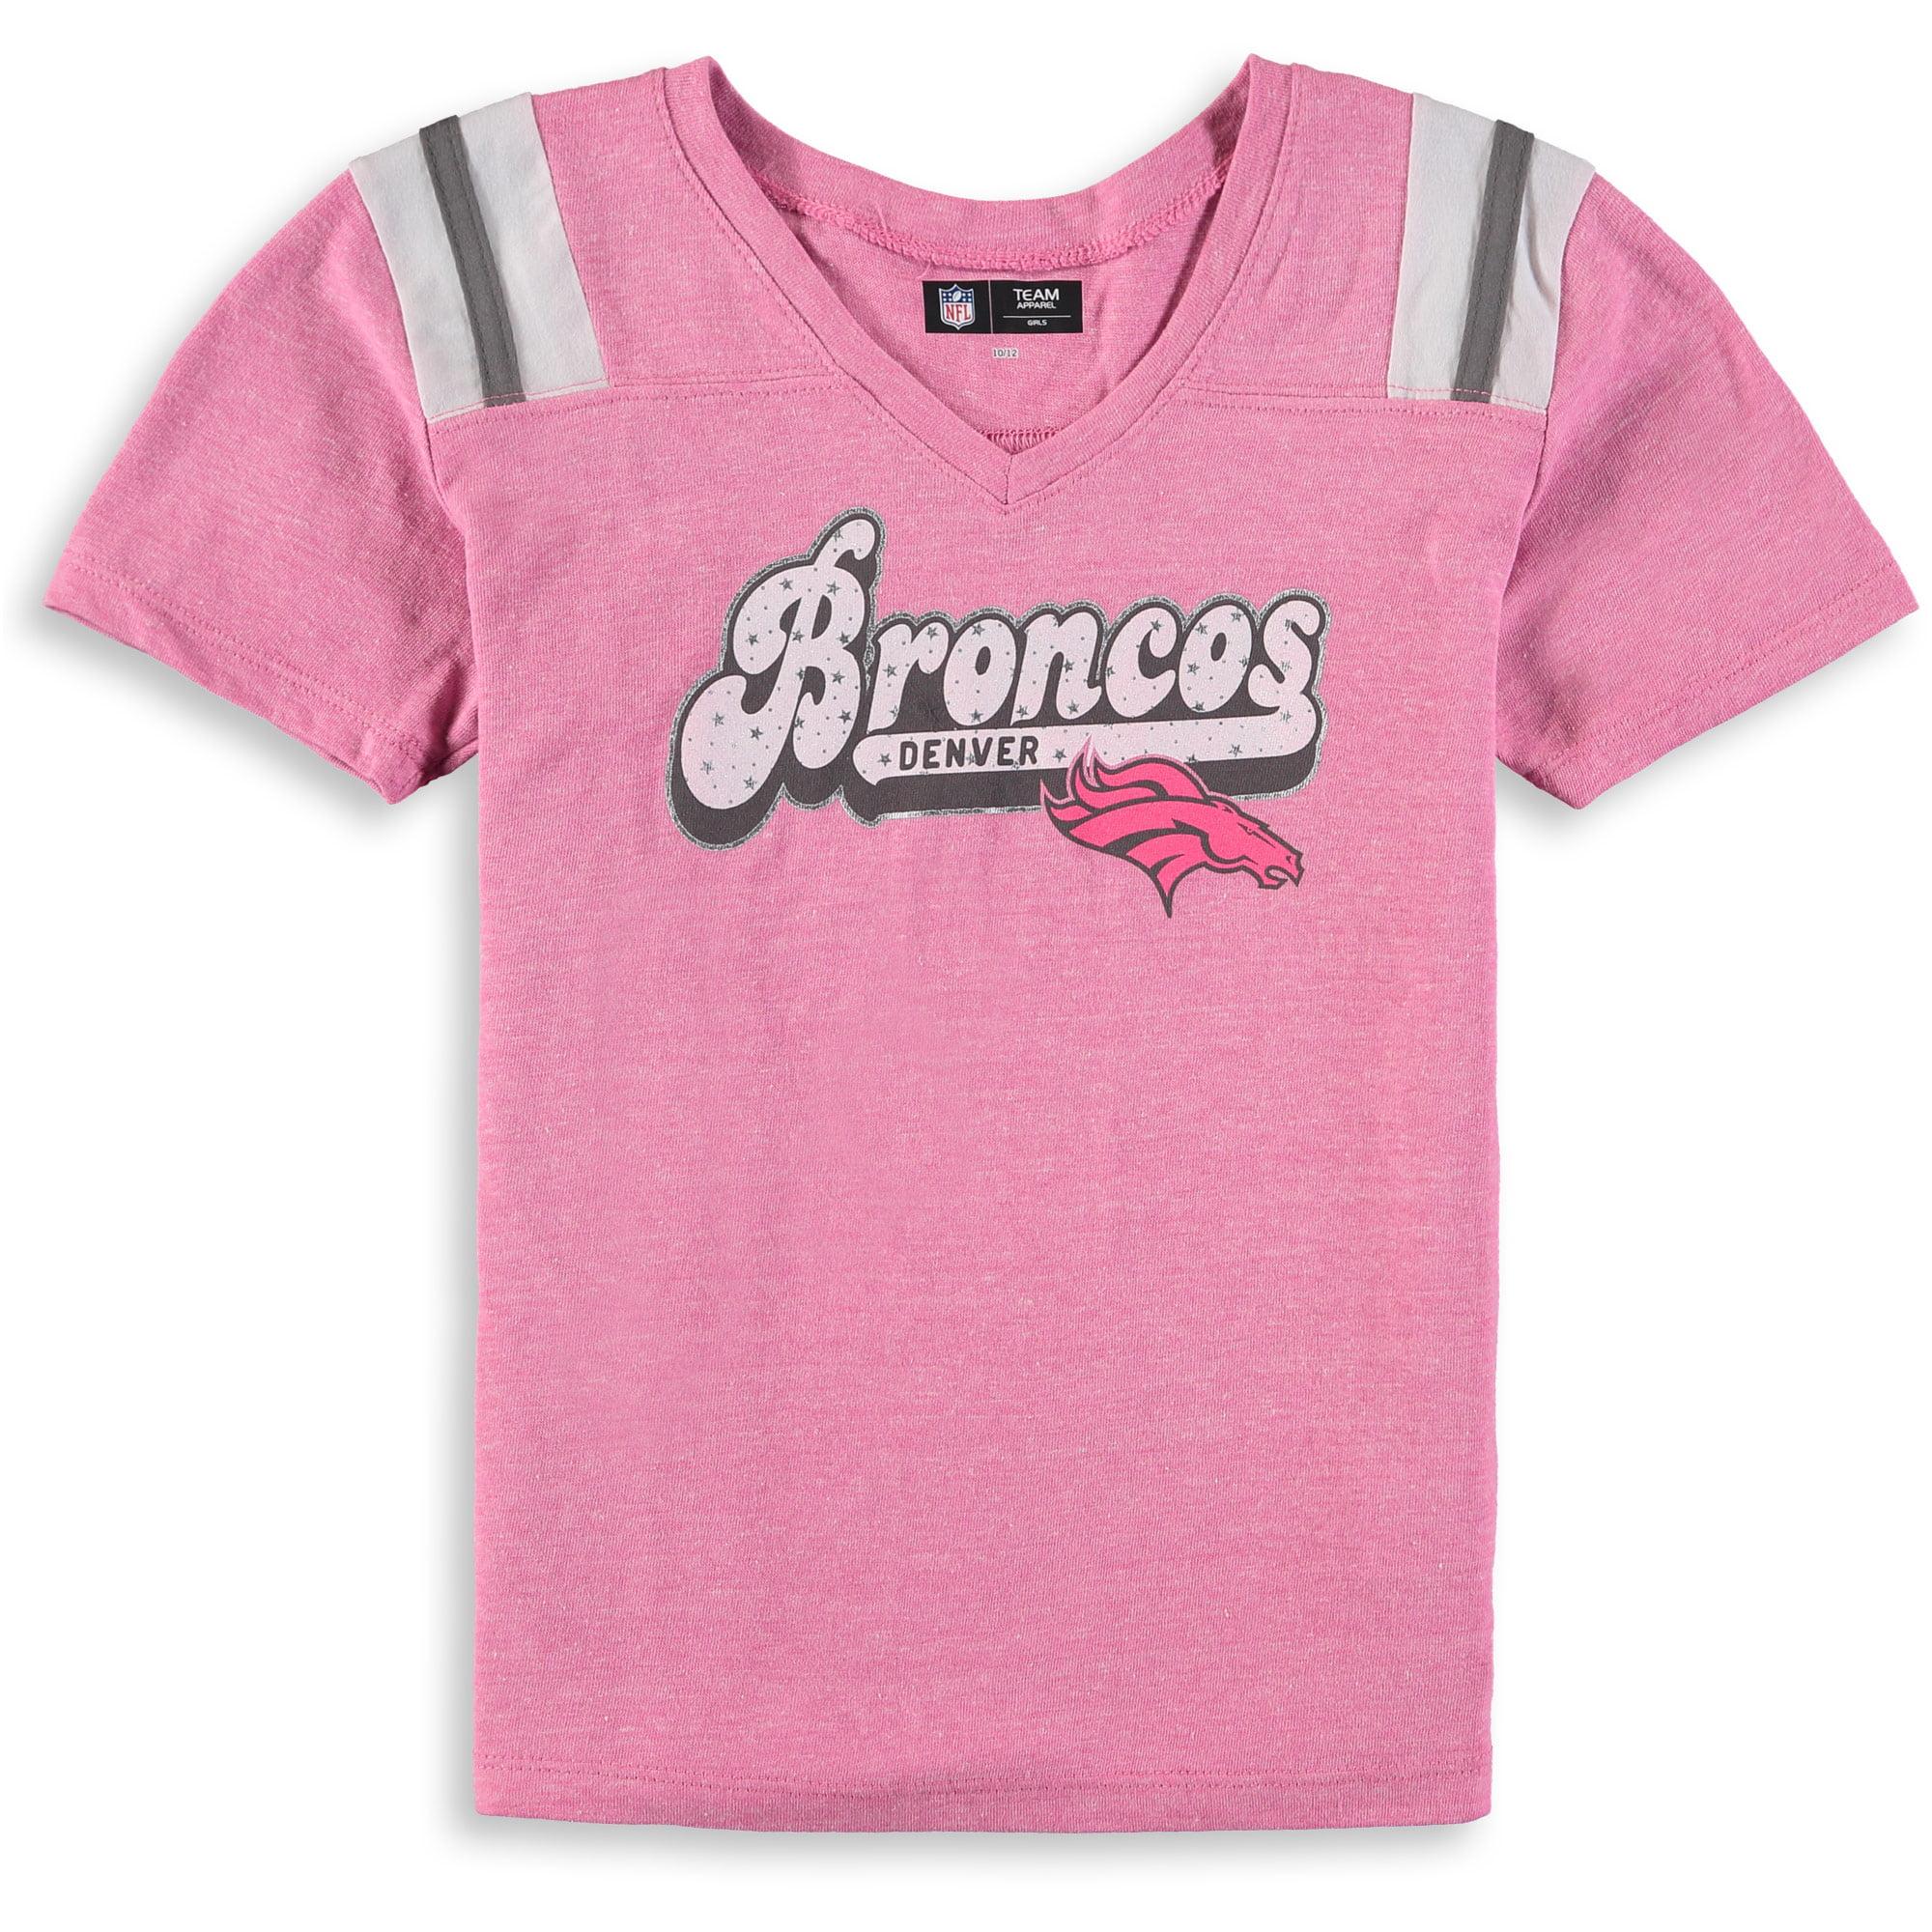 Denver Broncos New Era Girls Youth Star of the Game Tri-Blend T-Shirt - Pink - Yth L